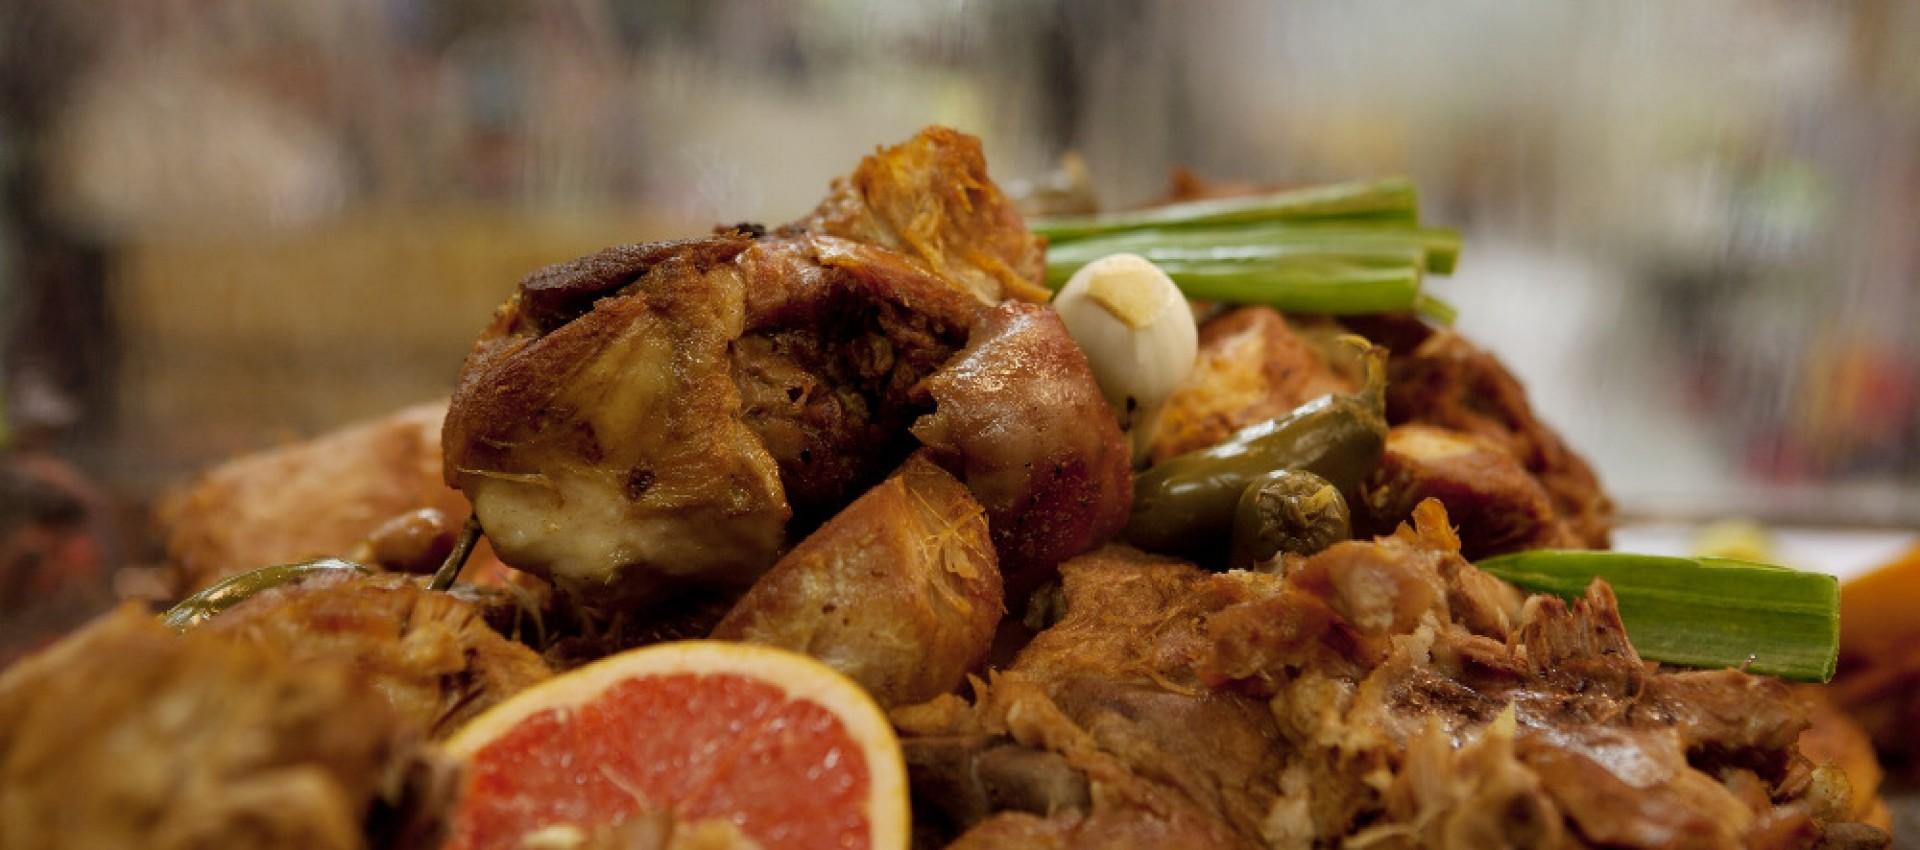 Pork Carnitas Image